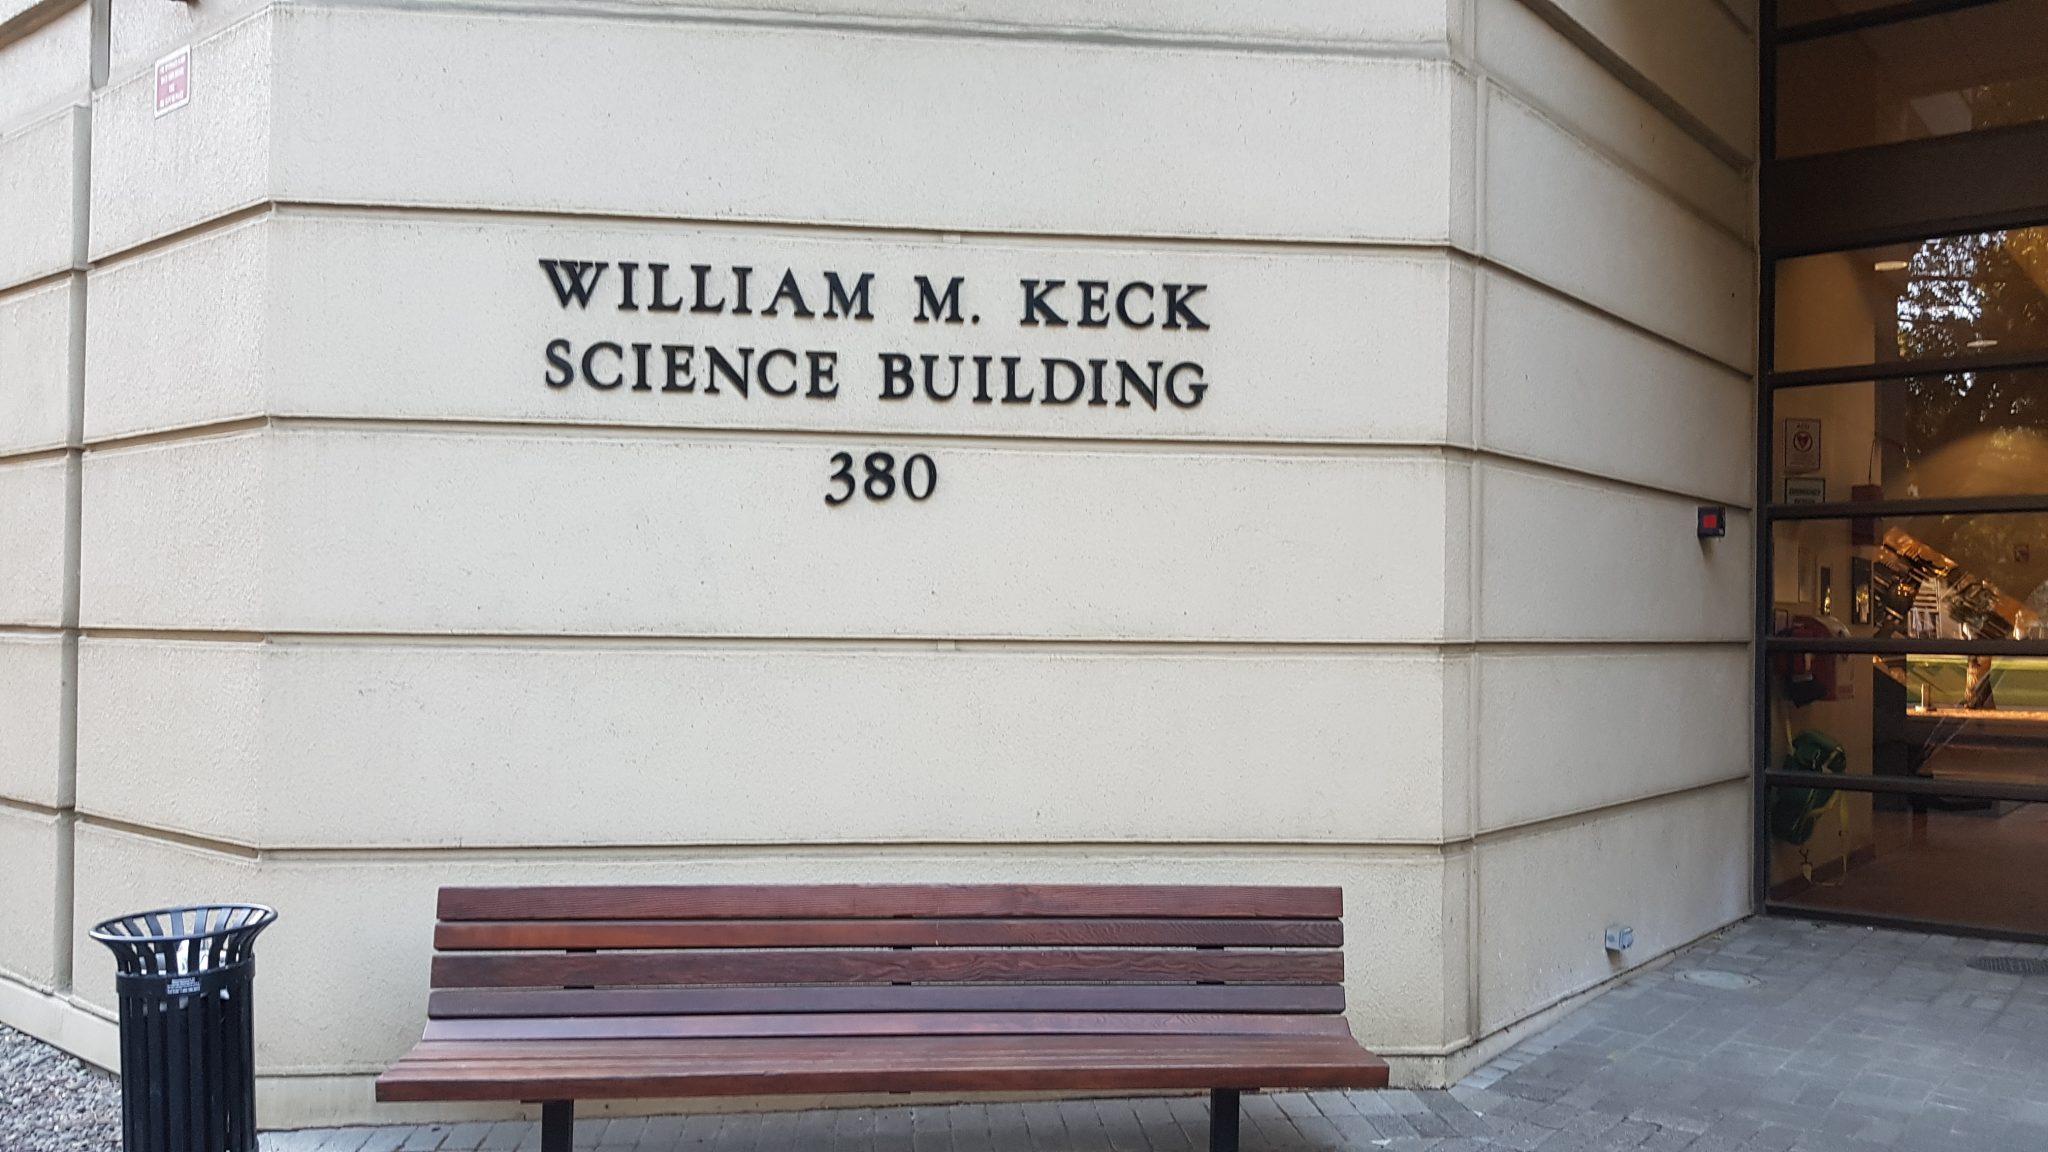 Keck Stanford